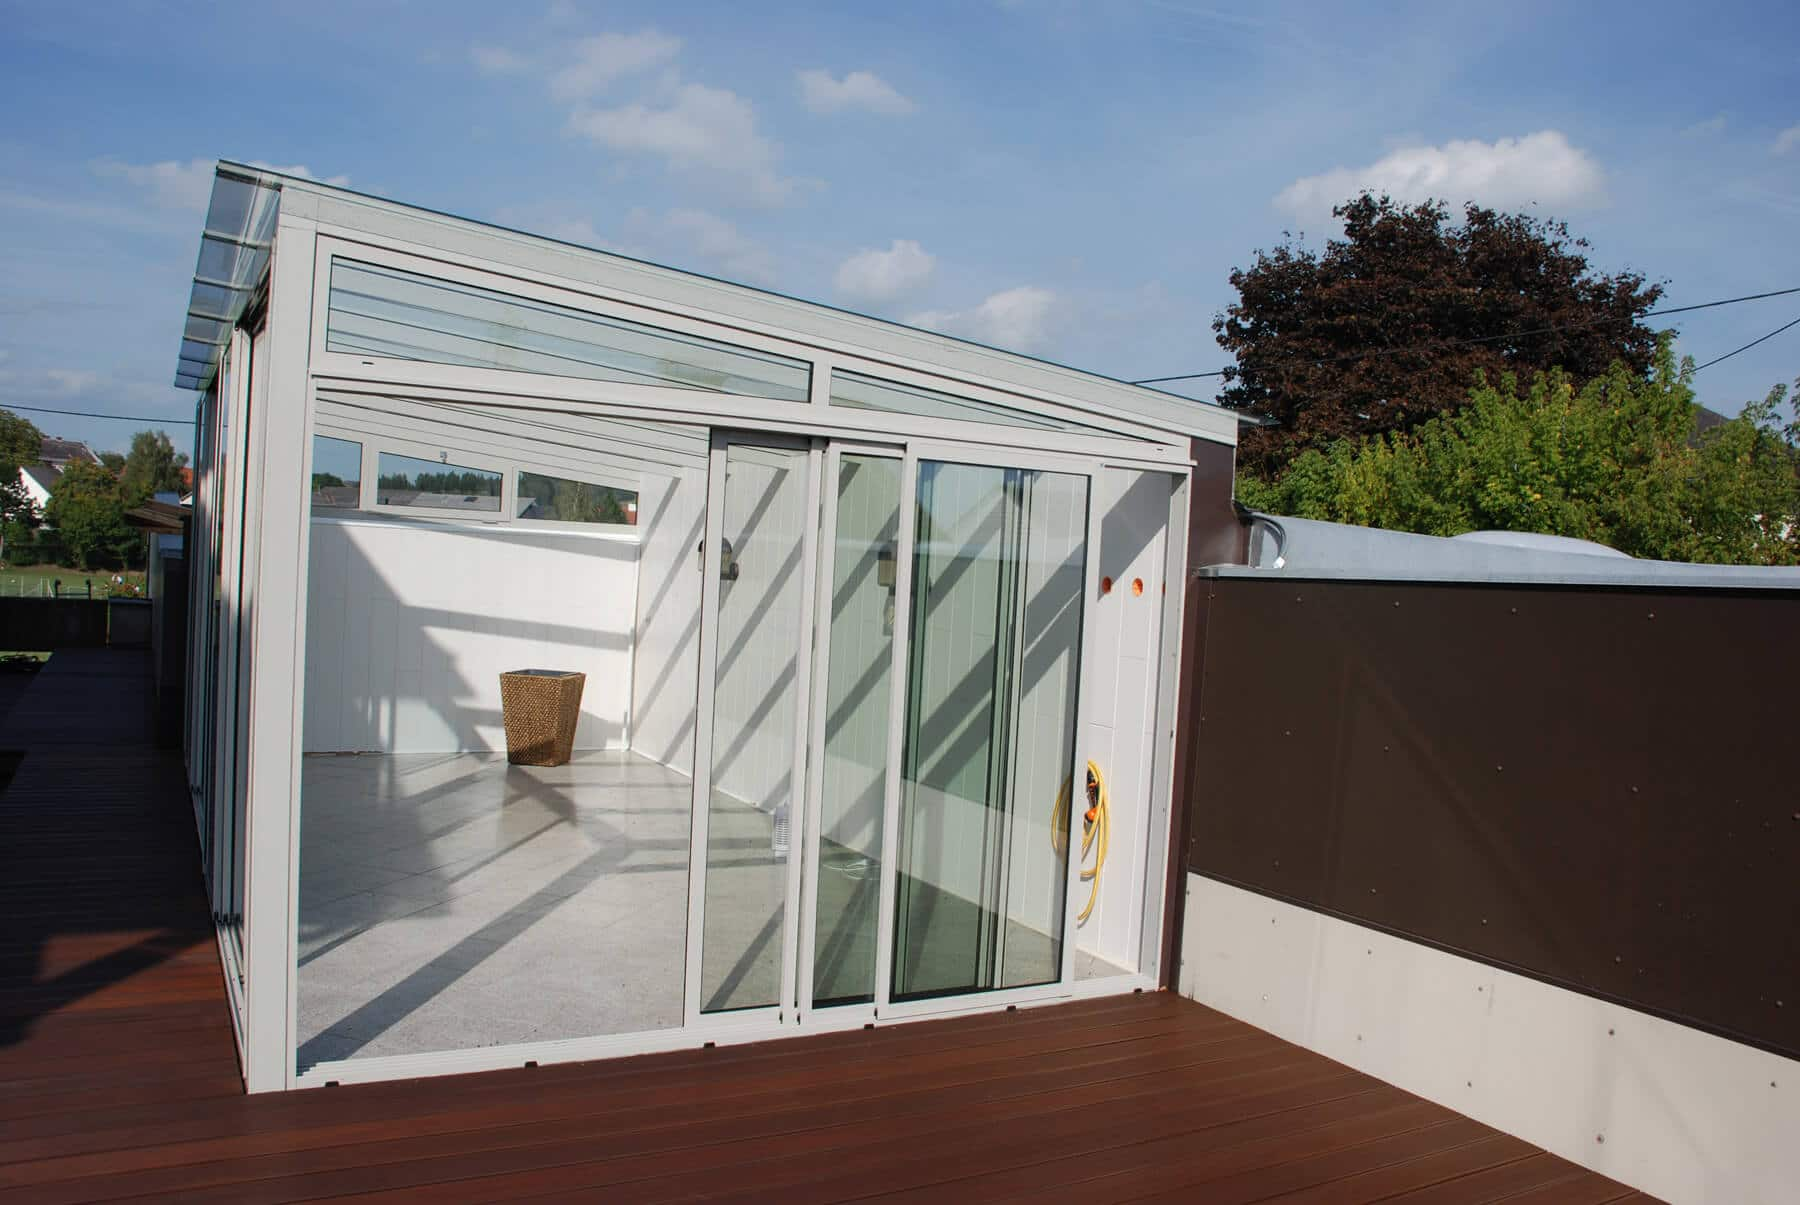 Wintergarten Falttüren falttüren glas optimaler windschutz für terrasse und balkon